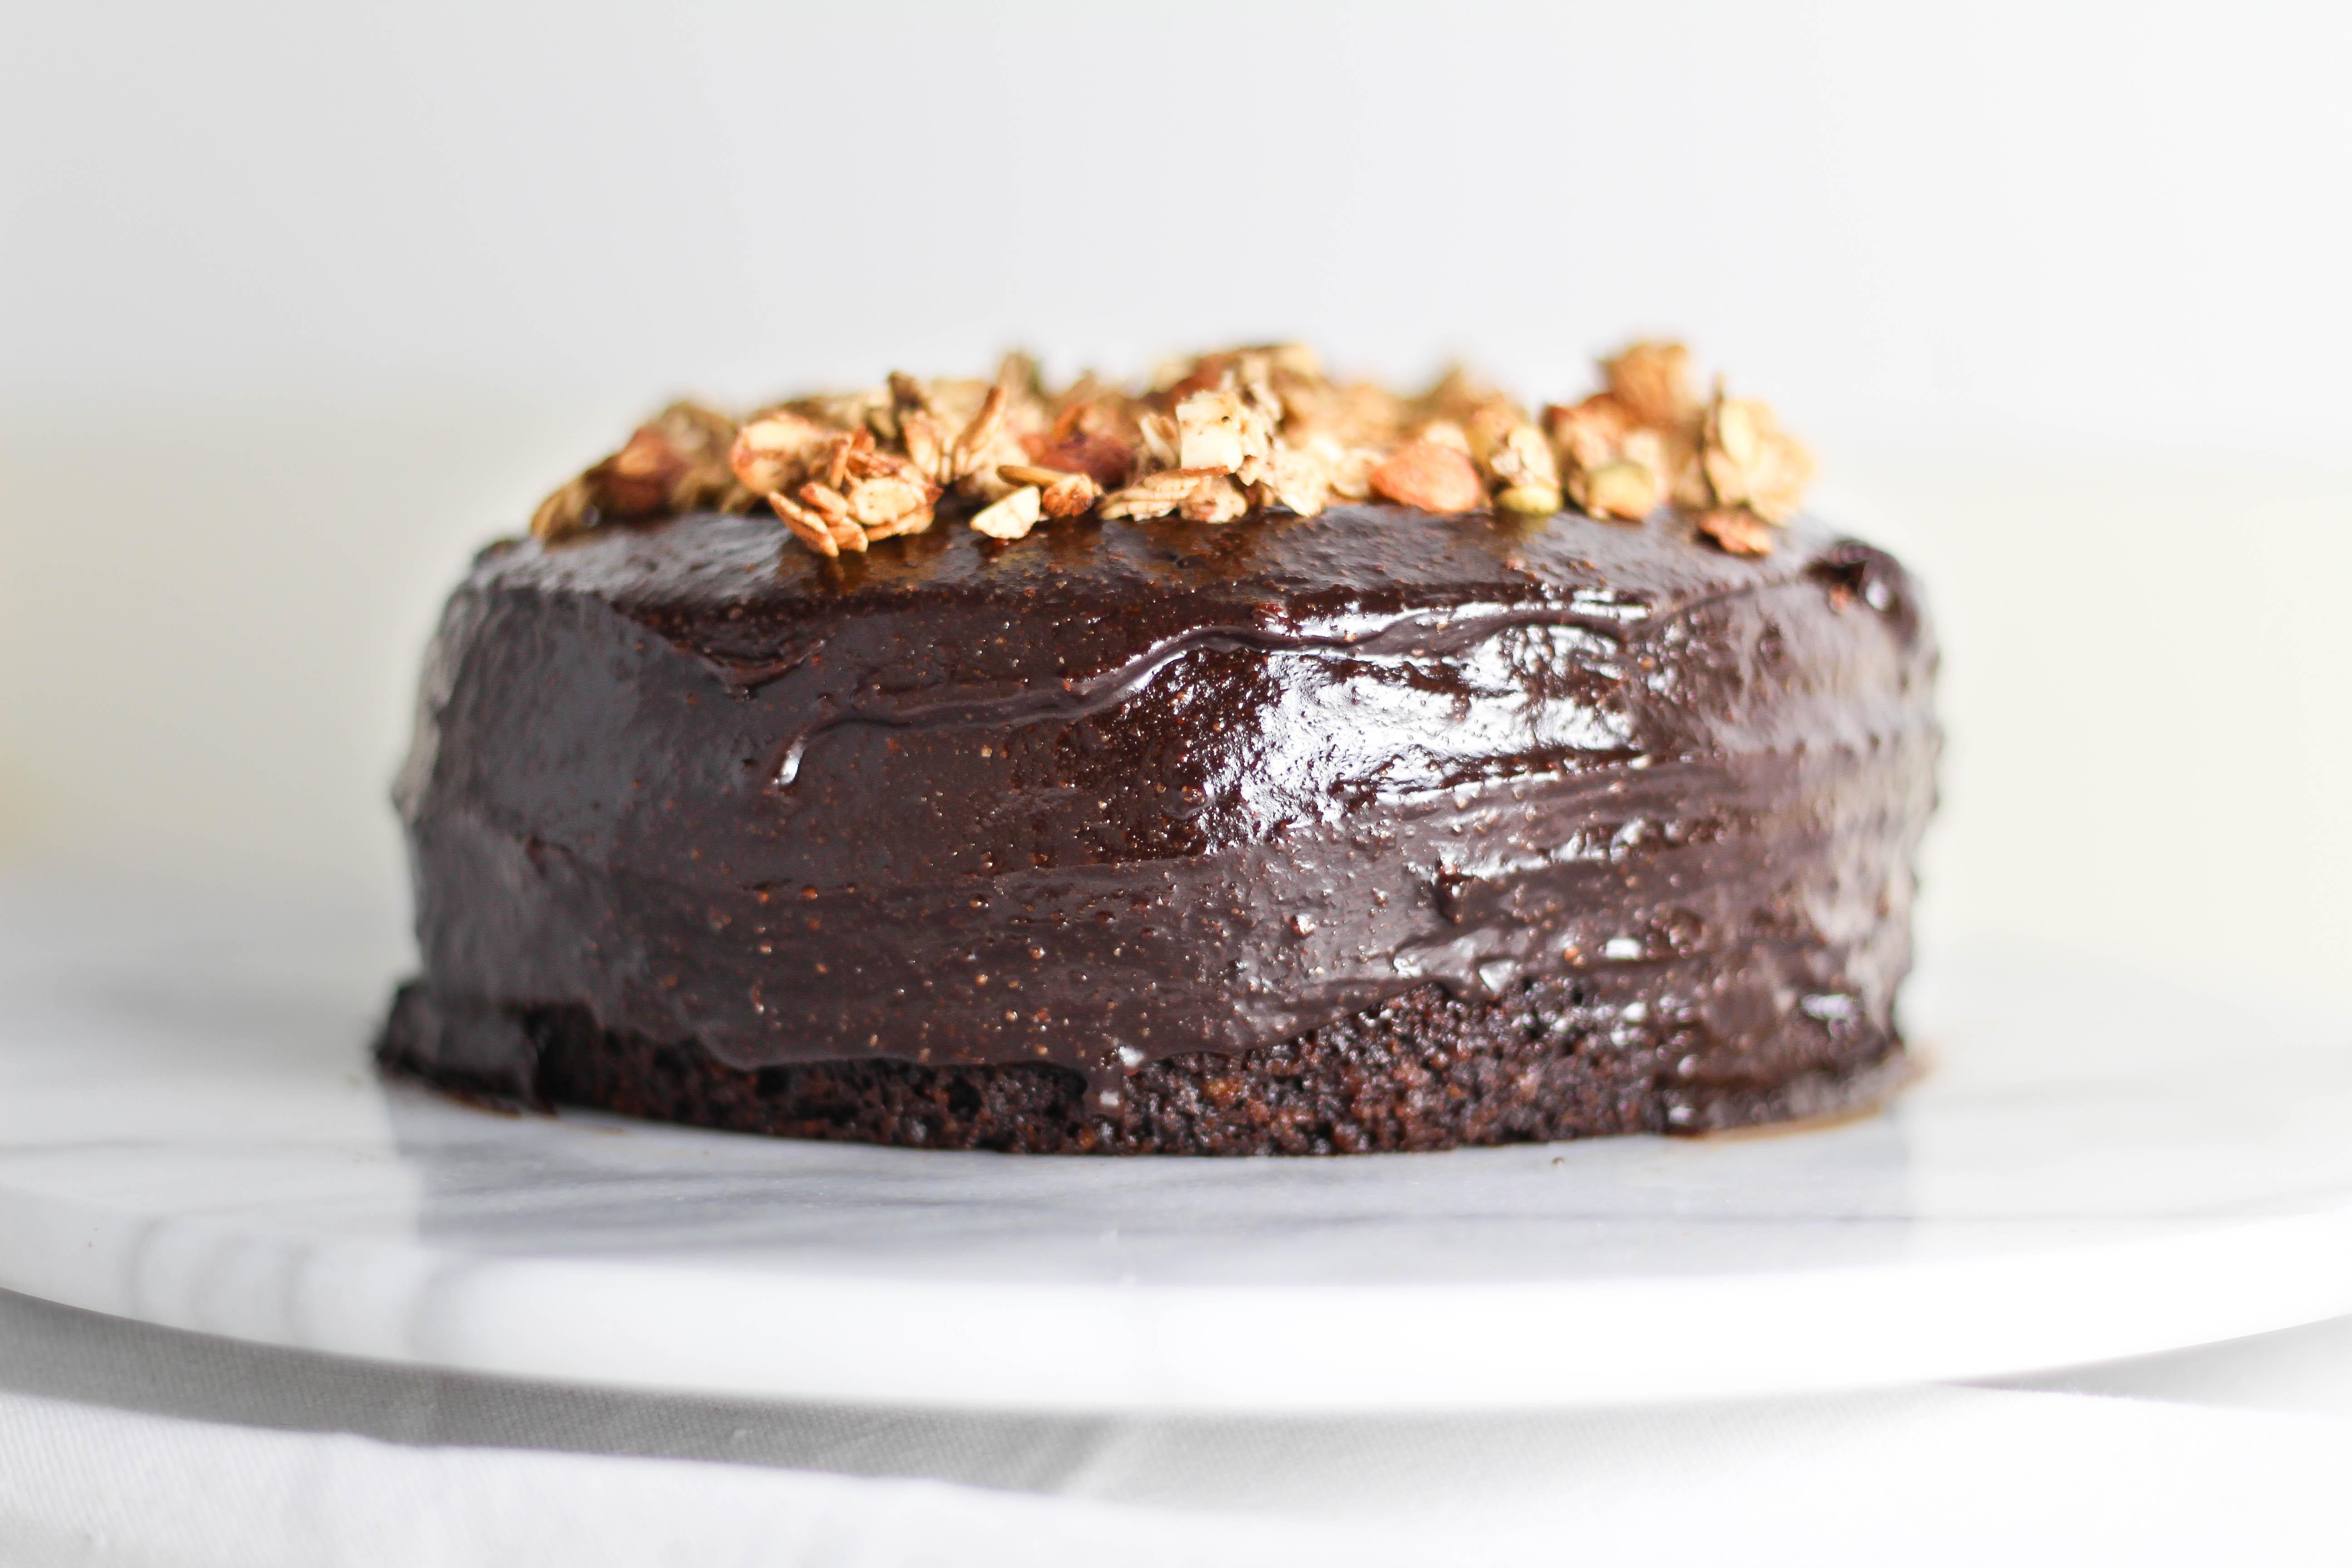 Bizcocho de Chocolate Sin Gluten | The Wellbar journal